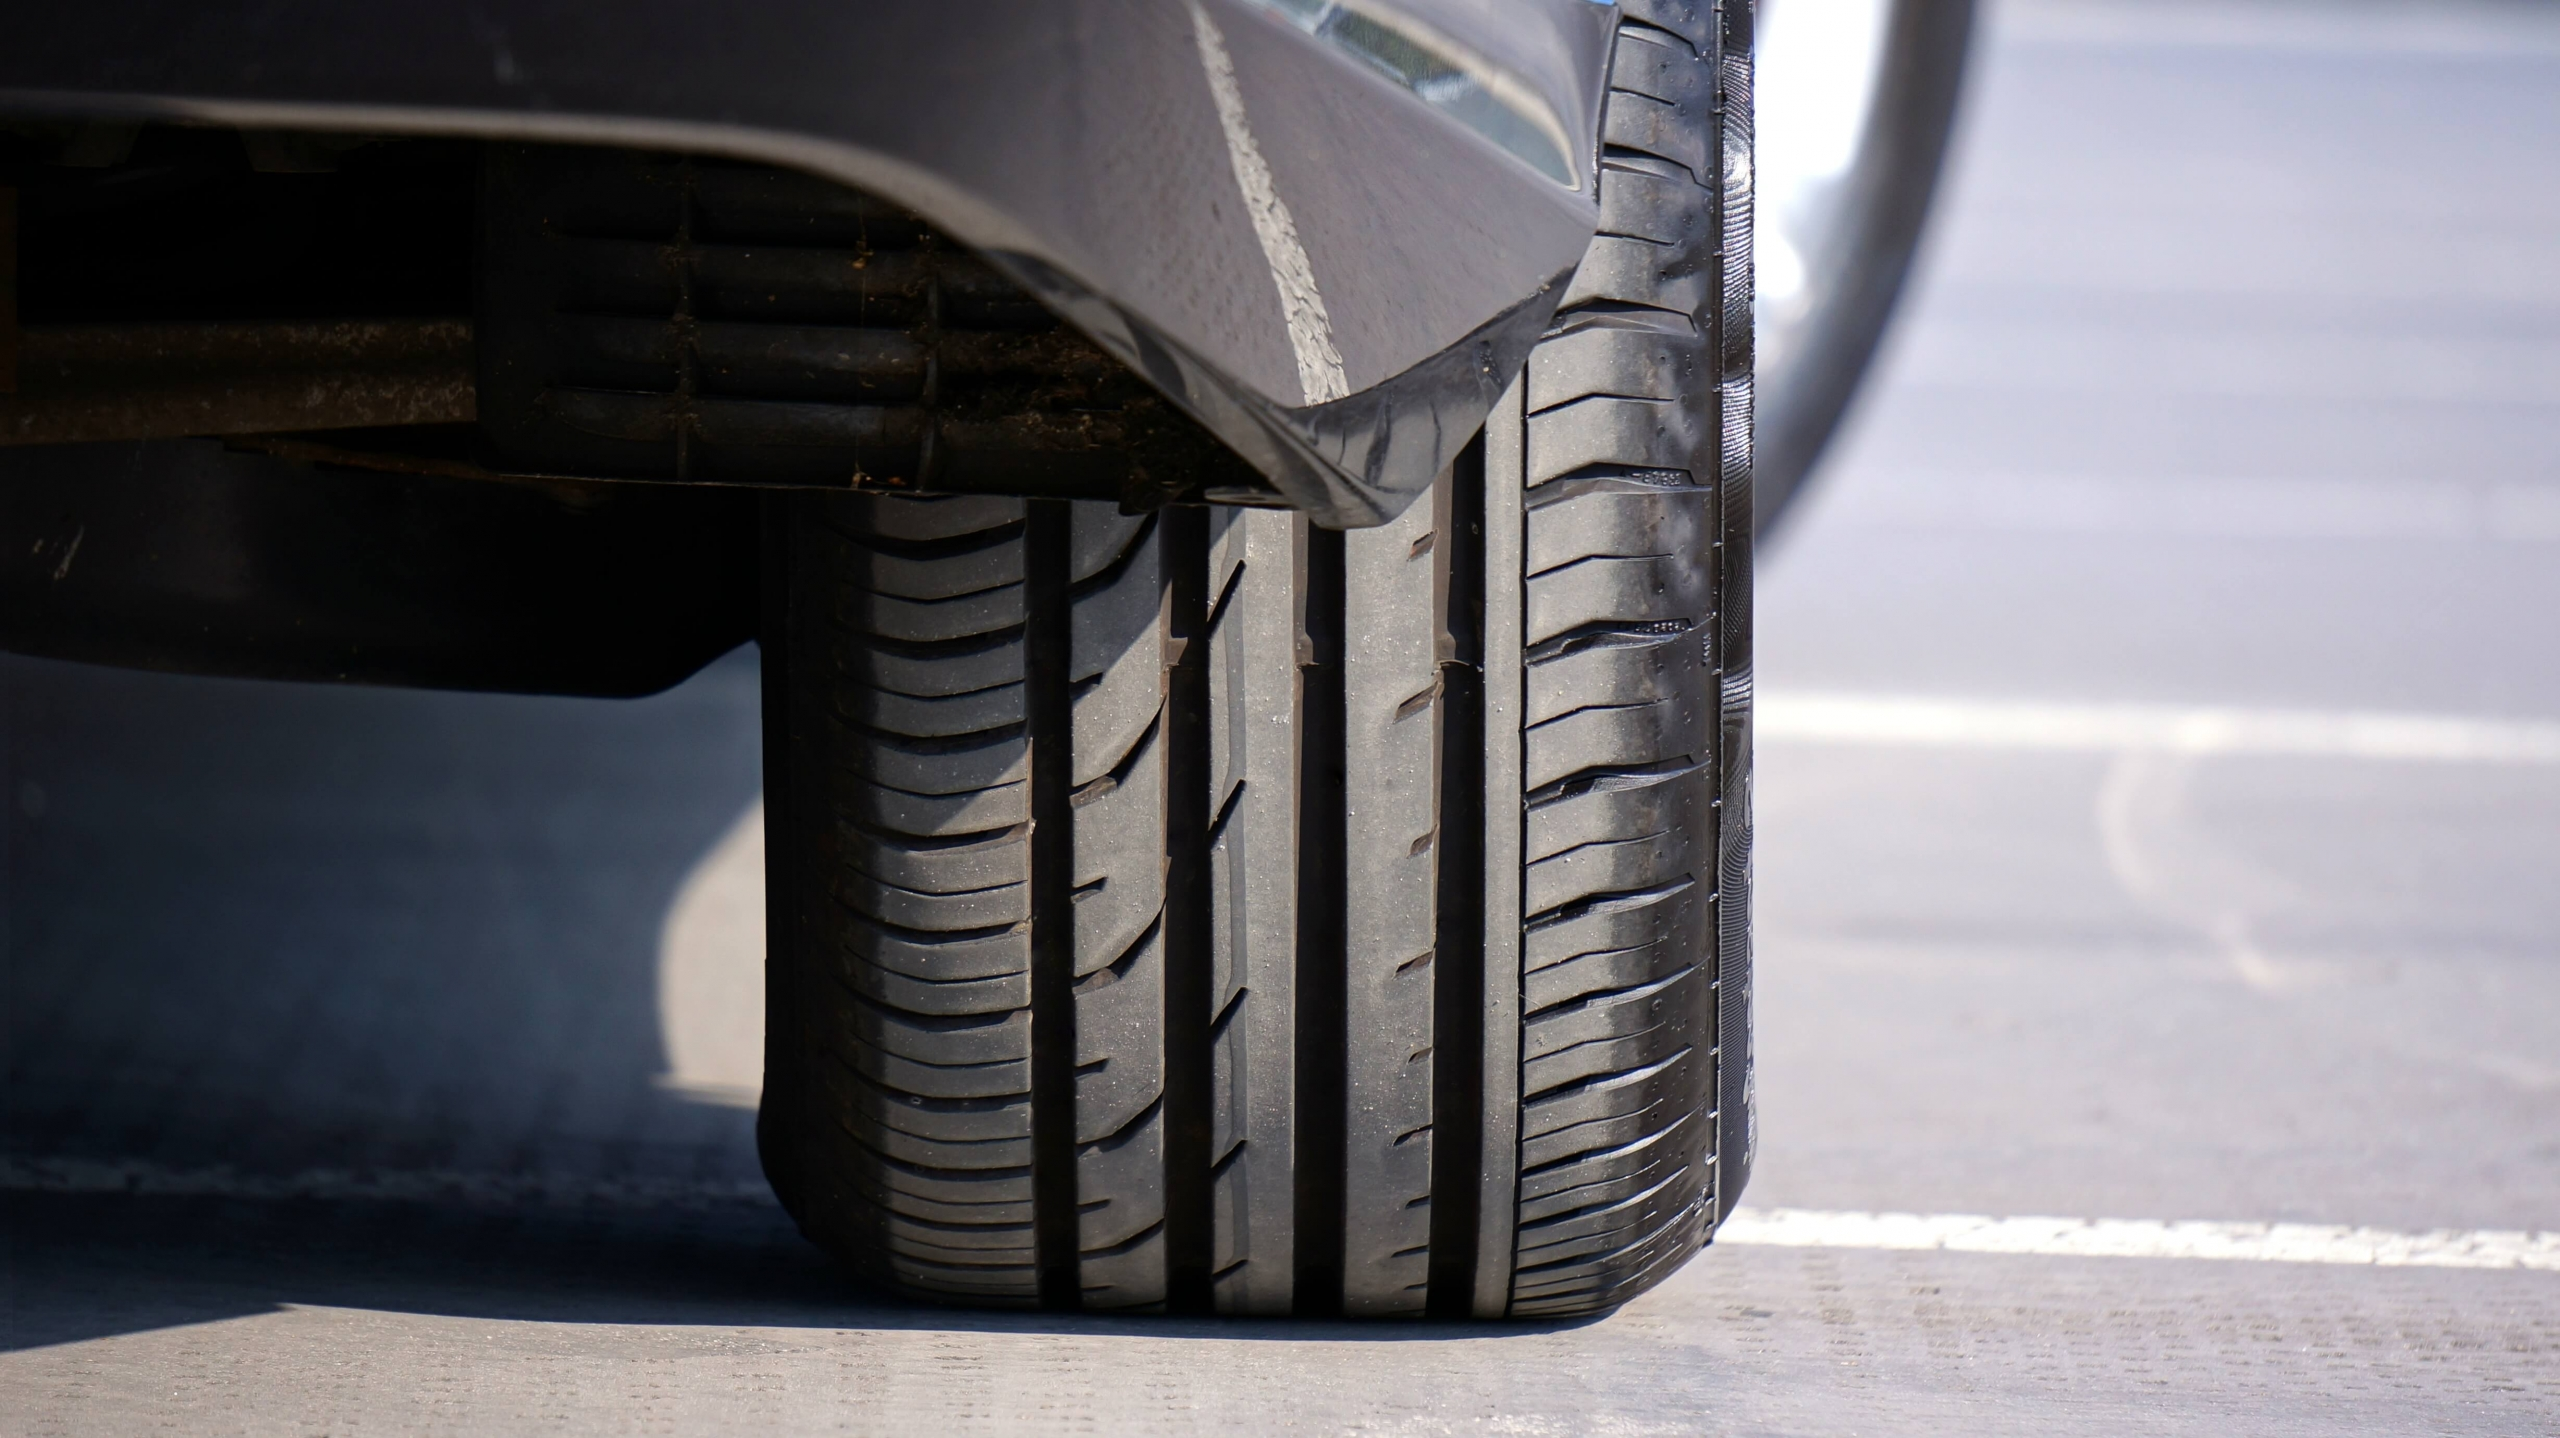 Seguro Neumáticos